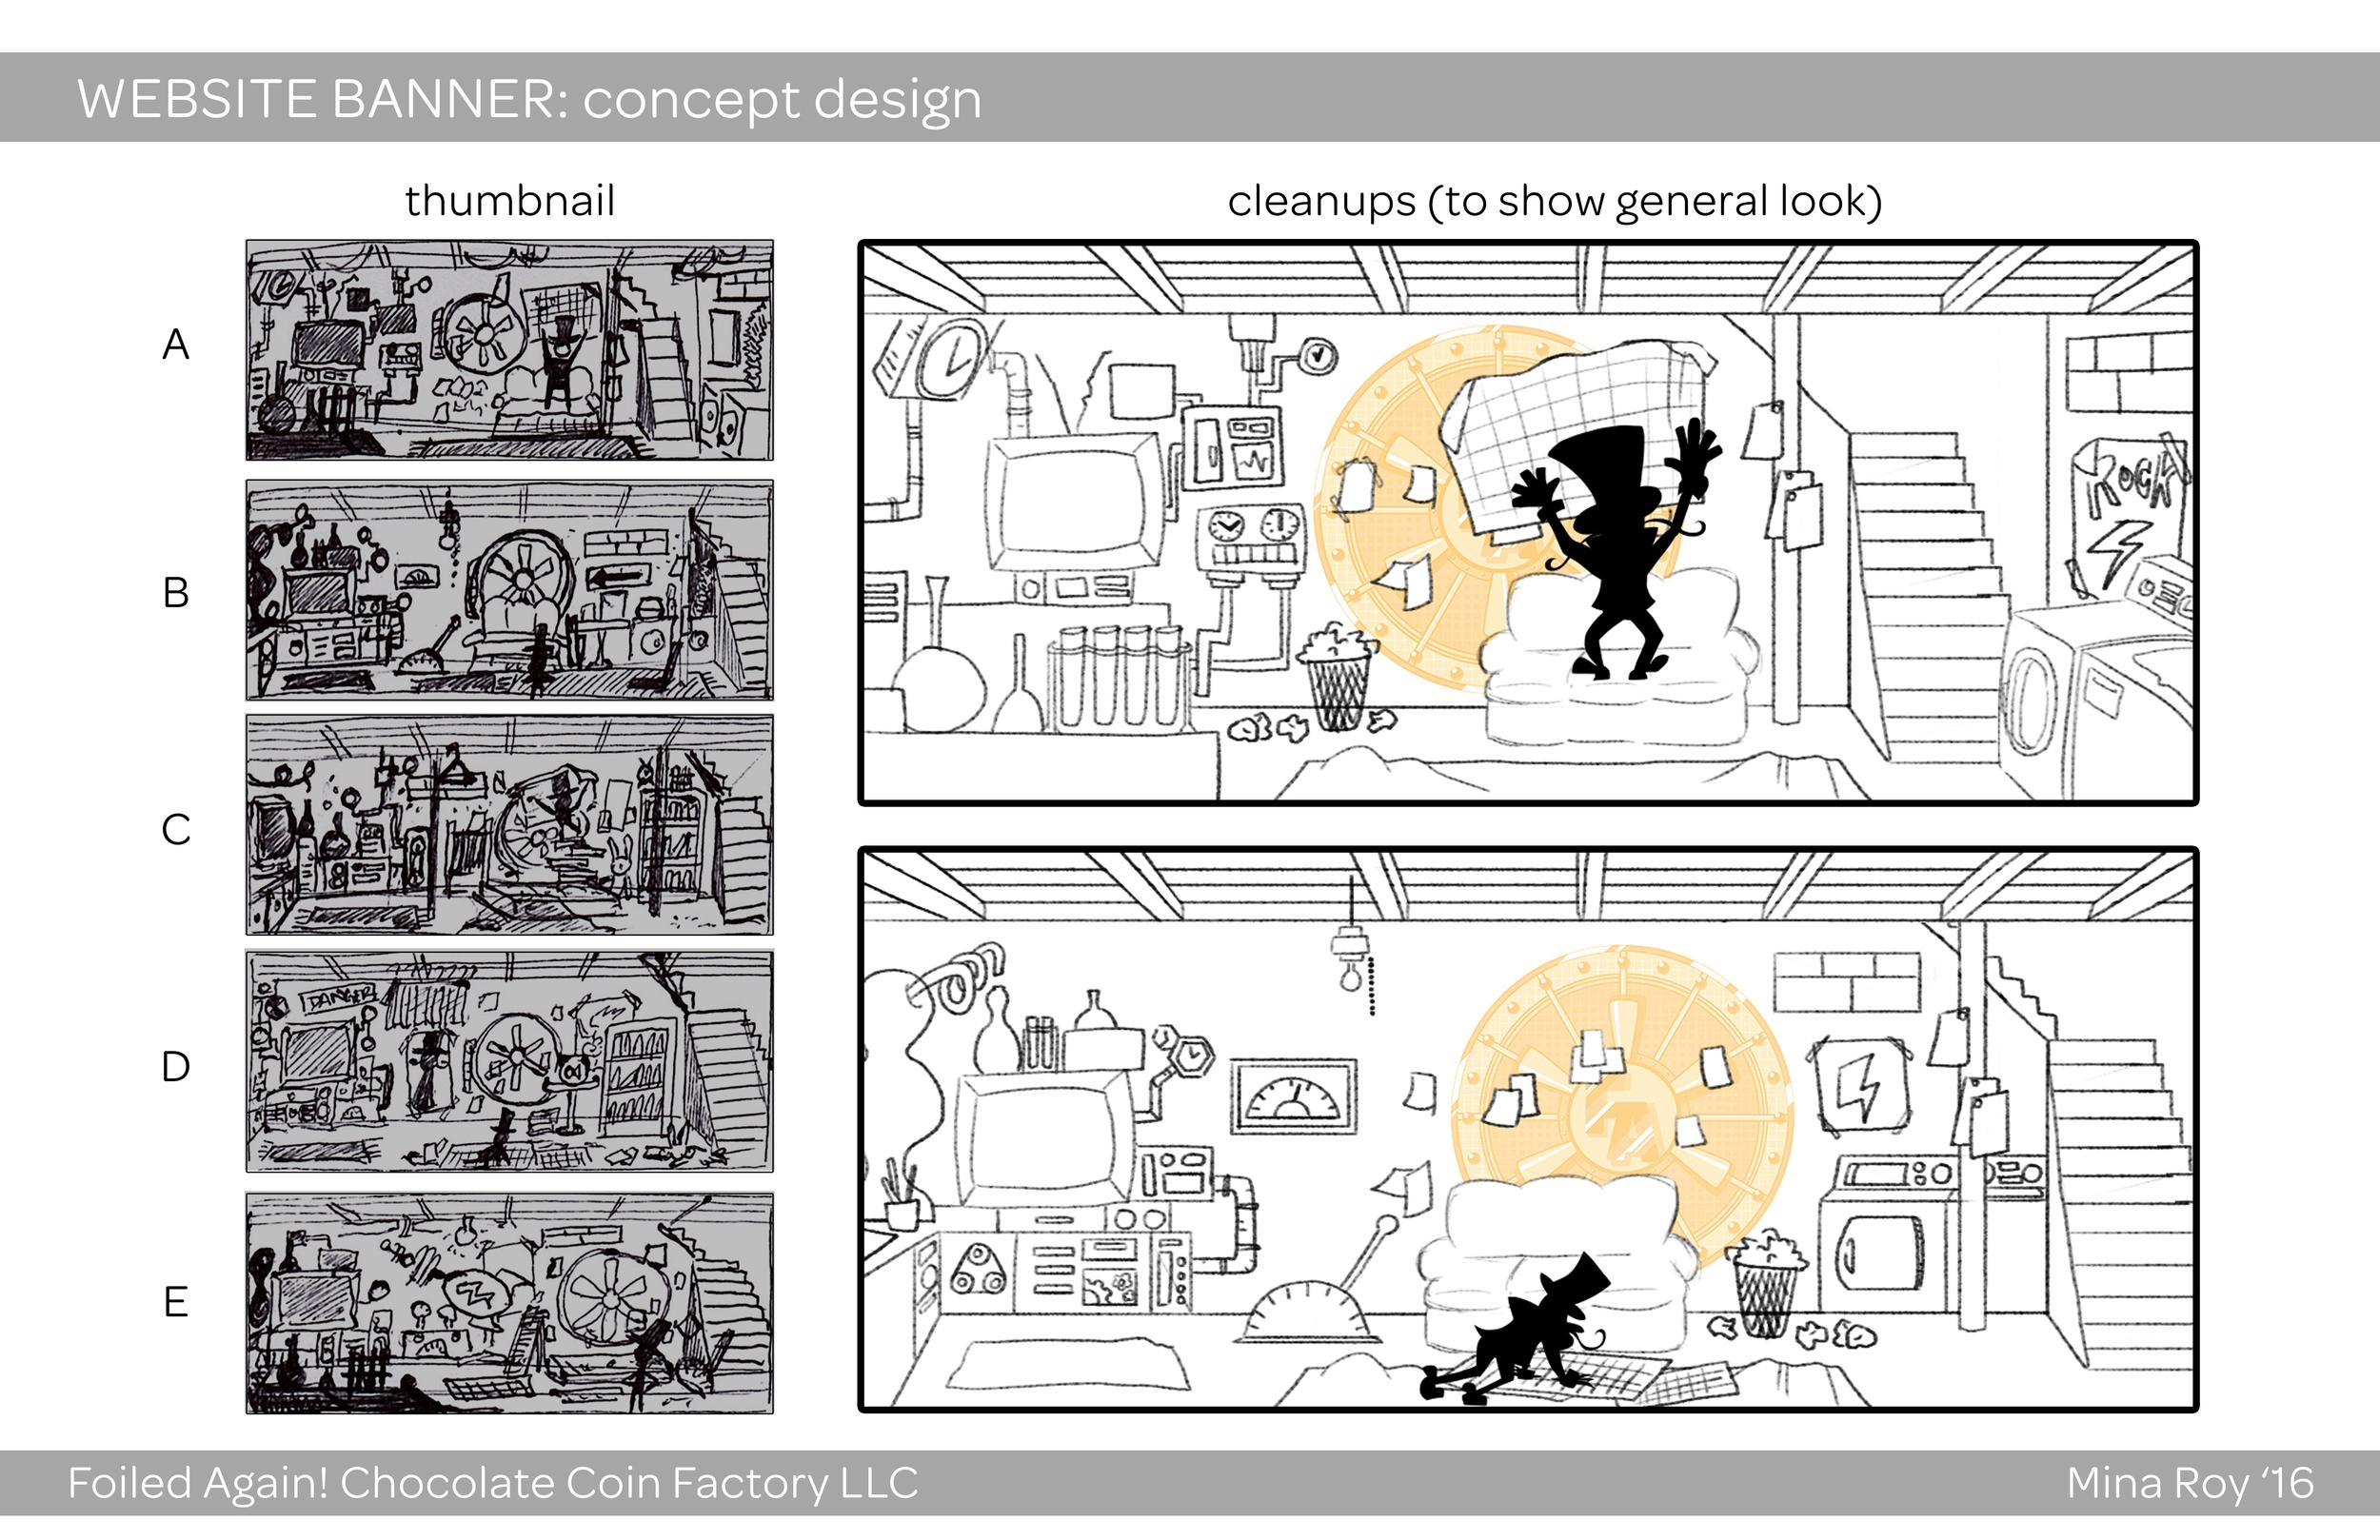 website banner-conceptdesign-presentation-a.jpg